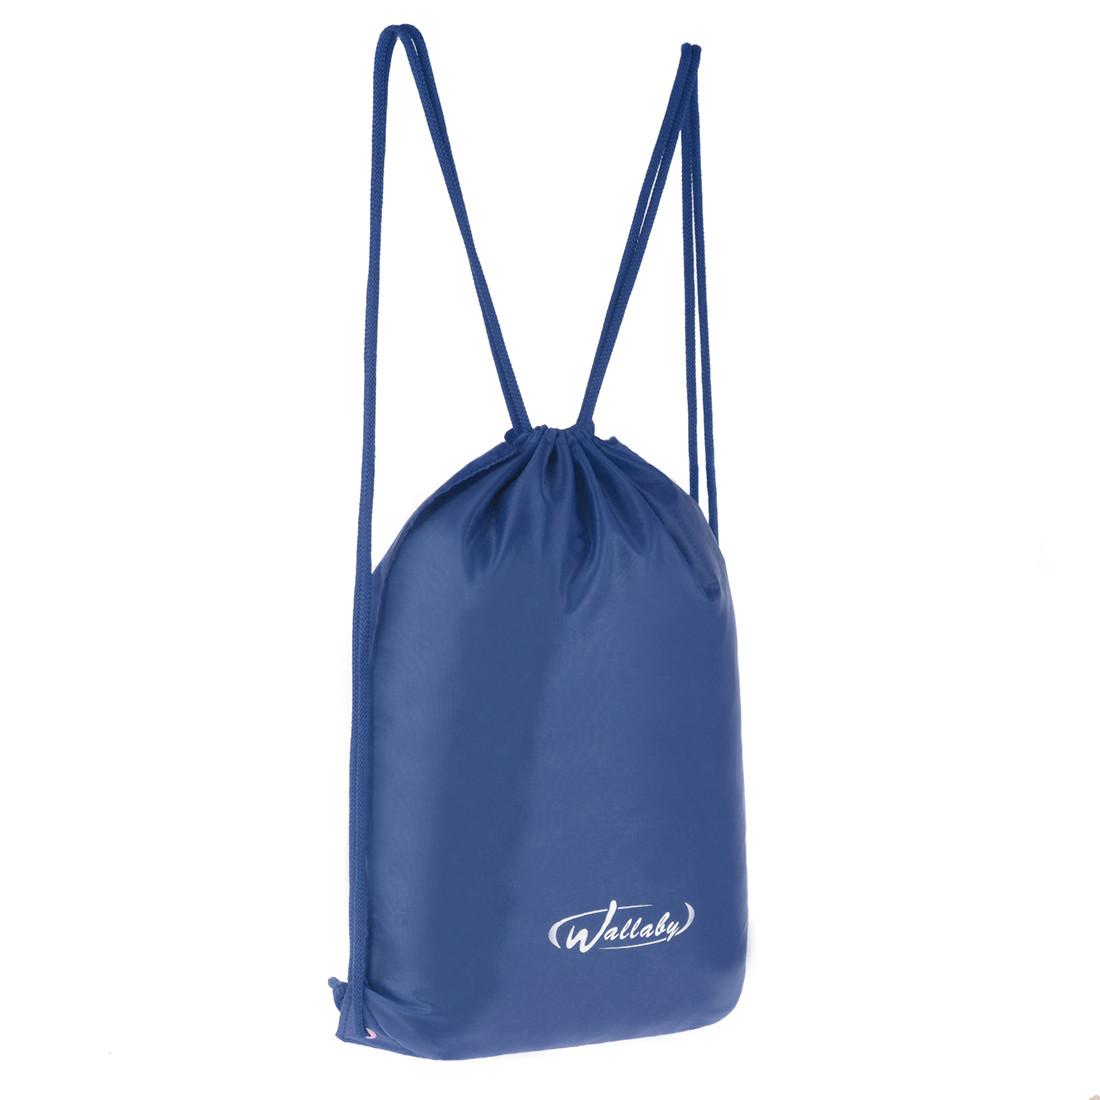 Рюкзак-котомка Wallaby для сменки и обуви 35х43х1 синий, материал нейлон 420 Д  в 28252син